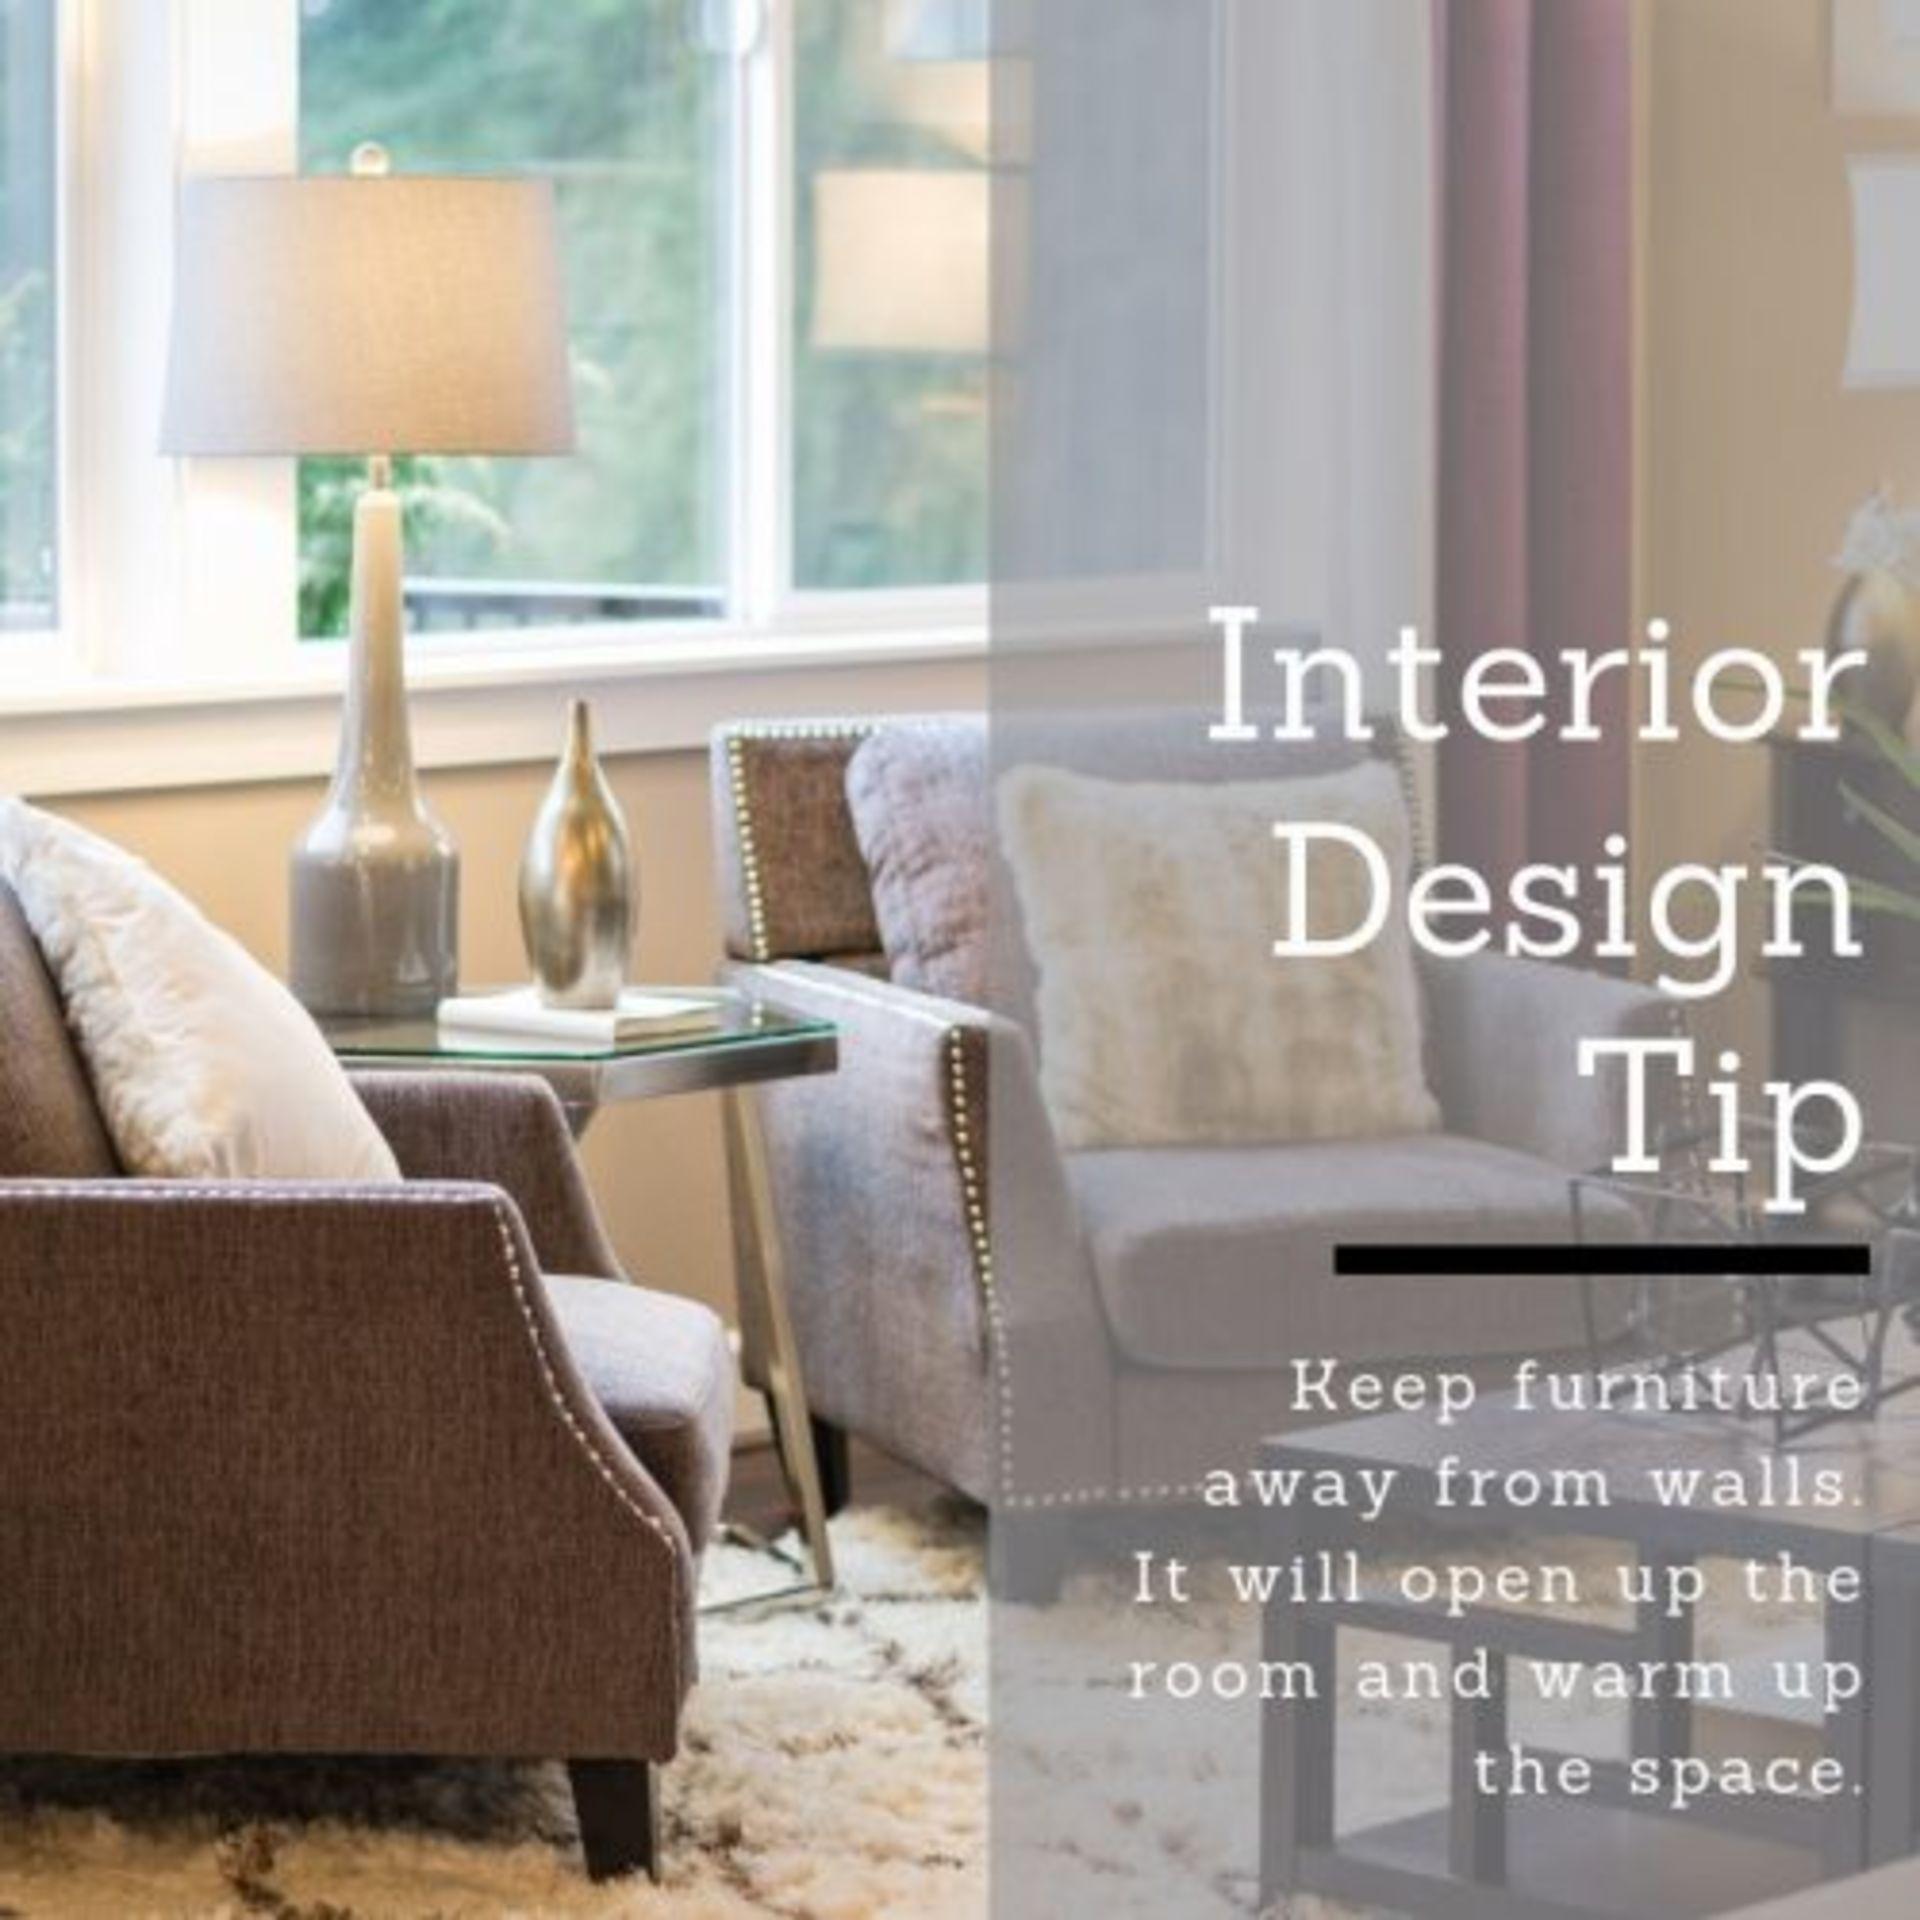 Interior Design THURSDAY TIP!